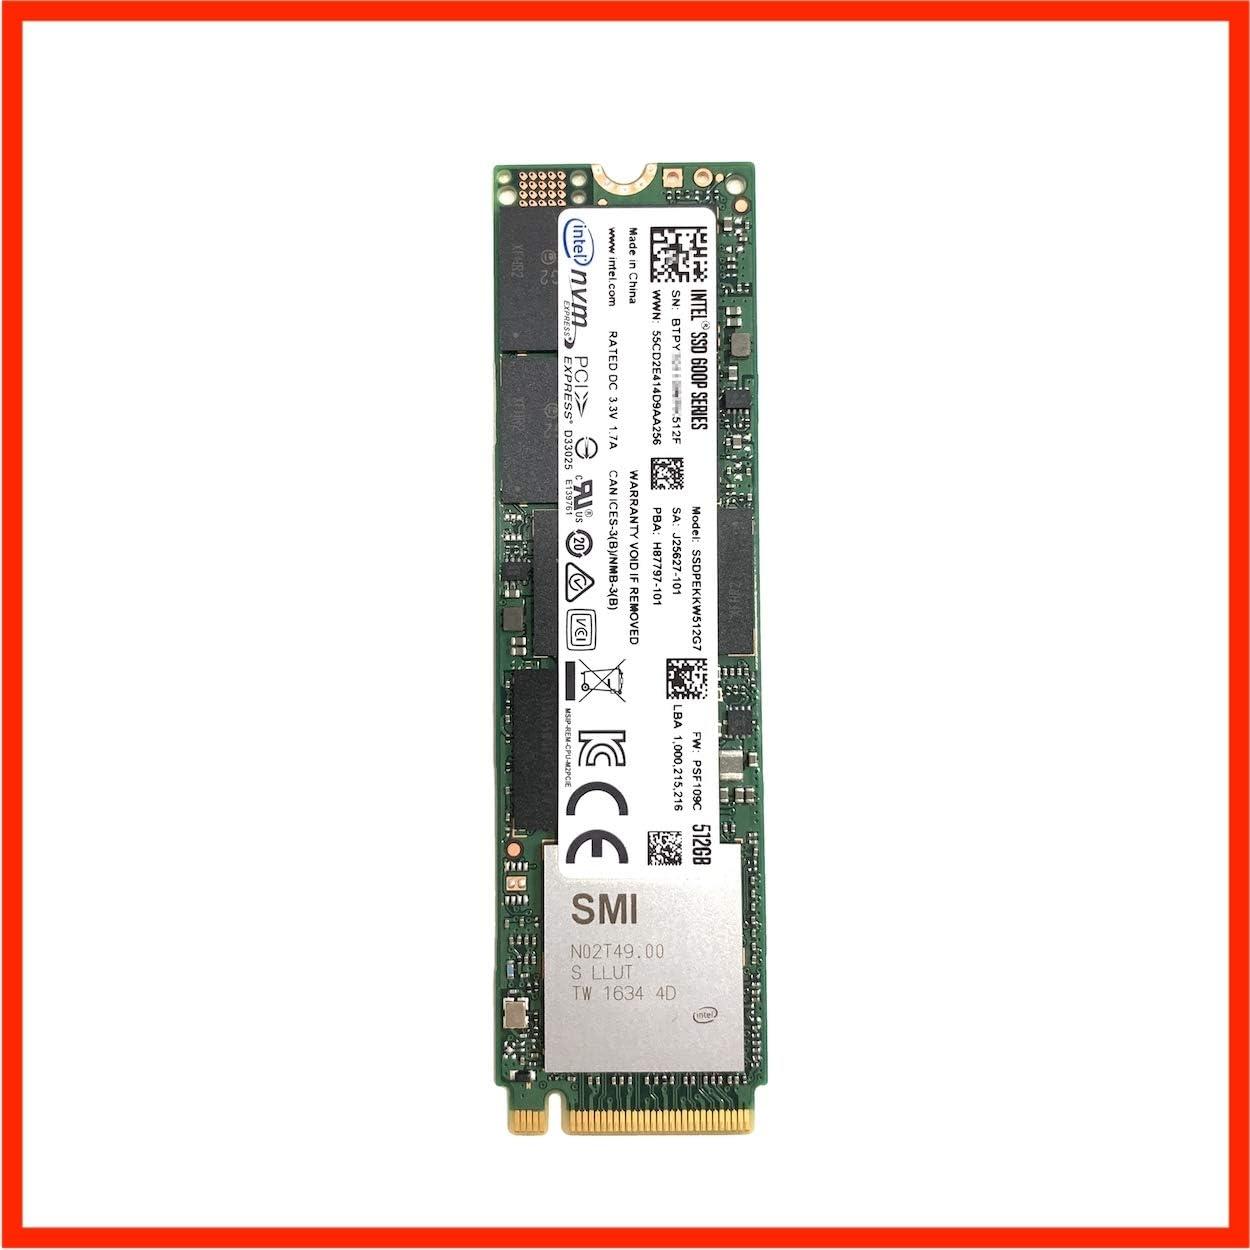 Intel (Nuevo) New 600P Series 512GB 500GB SSD NVMe PCIe 3.0 x 4 M ...